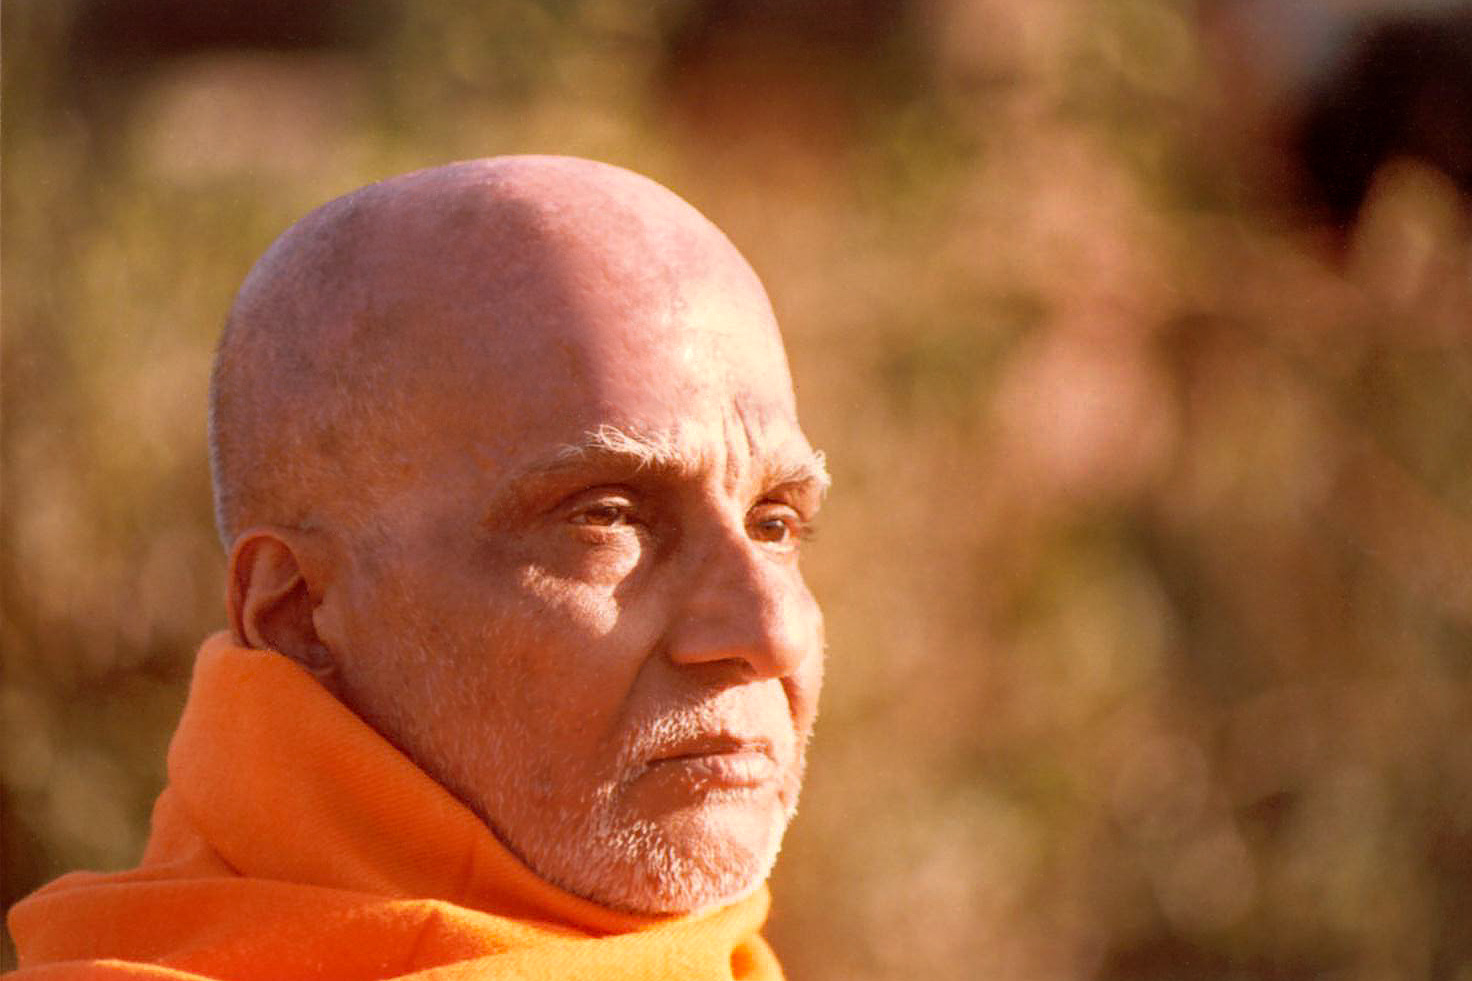 swami Swamiji himalayan yogi raj shri saraswati swami brahmananda.